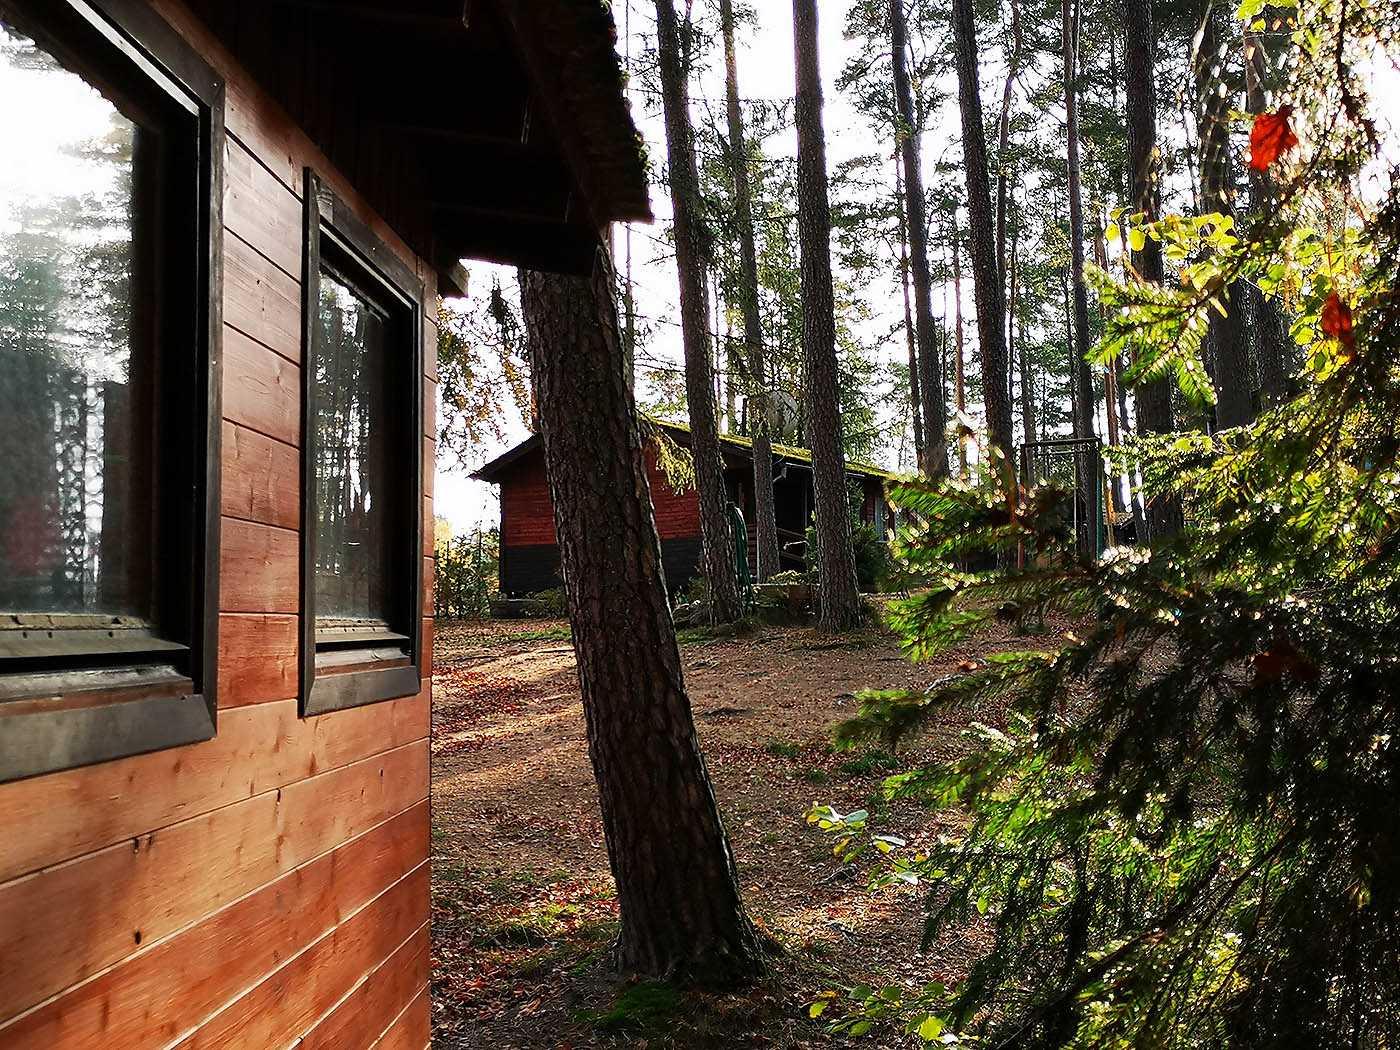 domki letniskowe kaszuby siedlisko bartek81